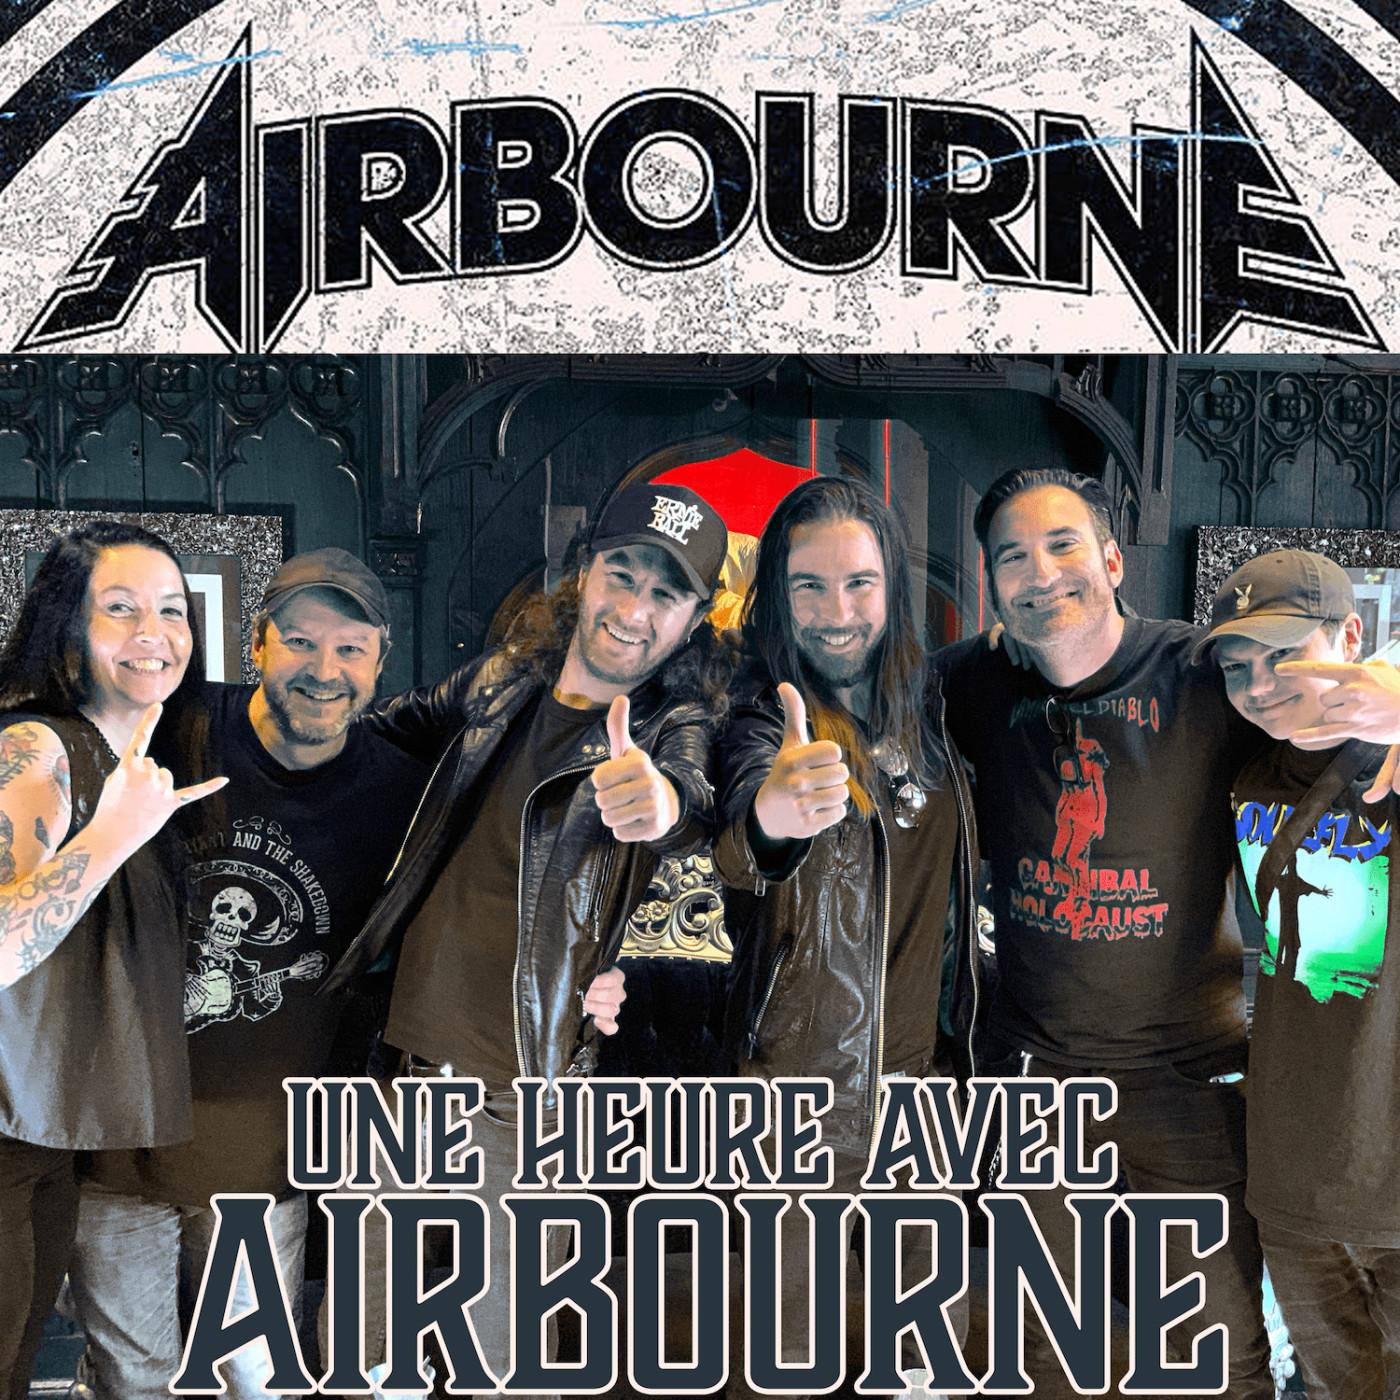 Une heure avec... Airbourne